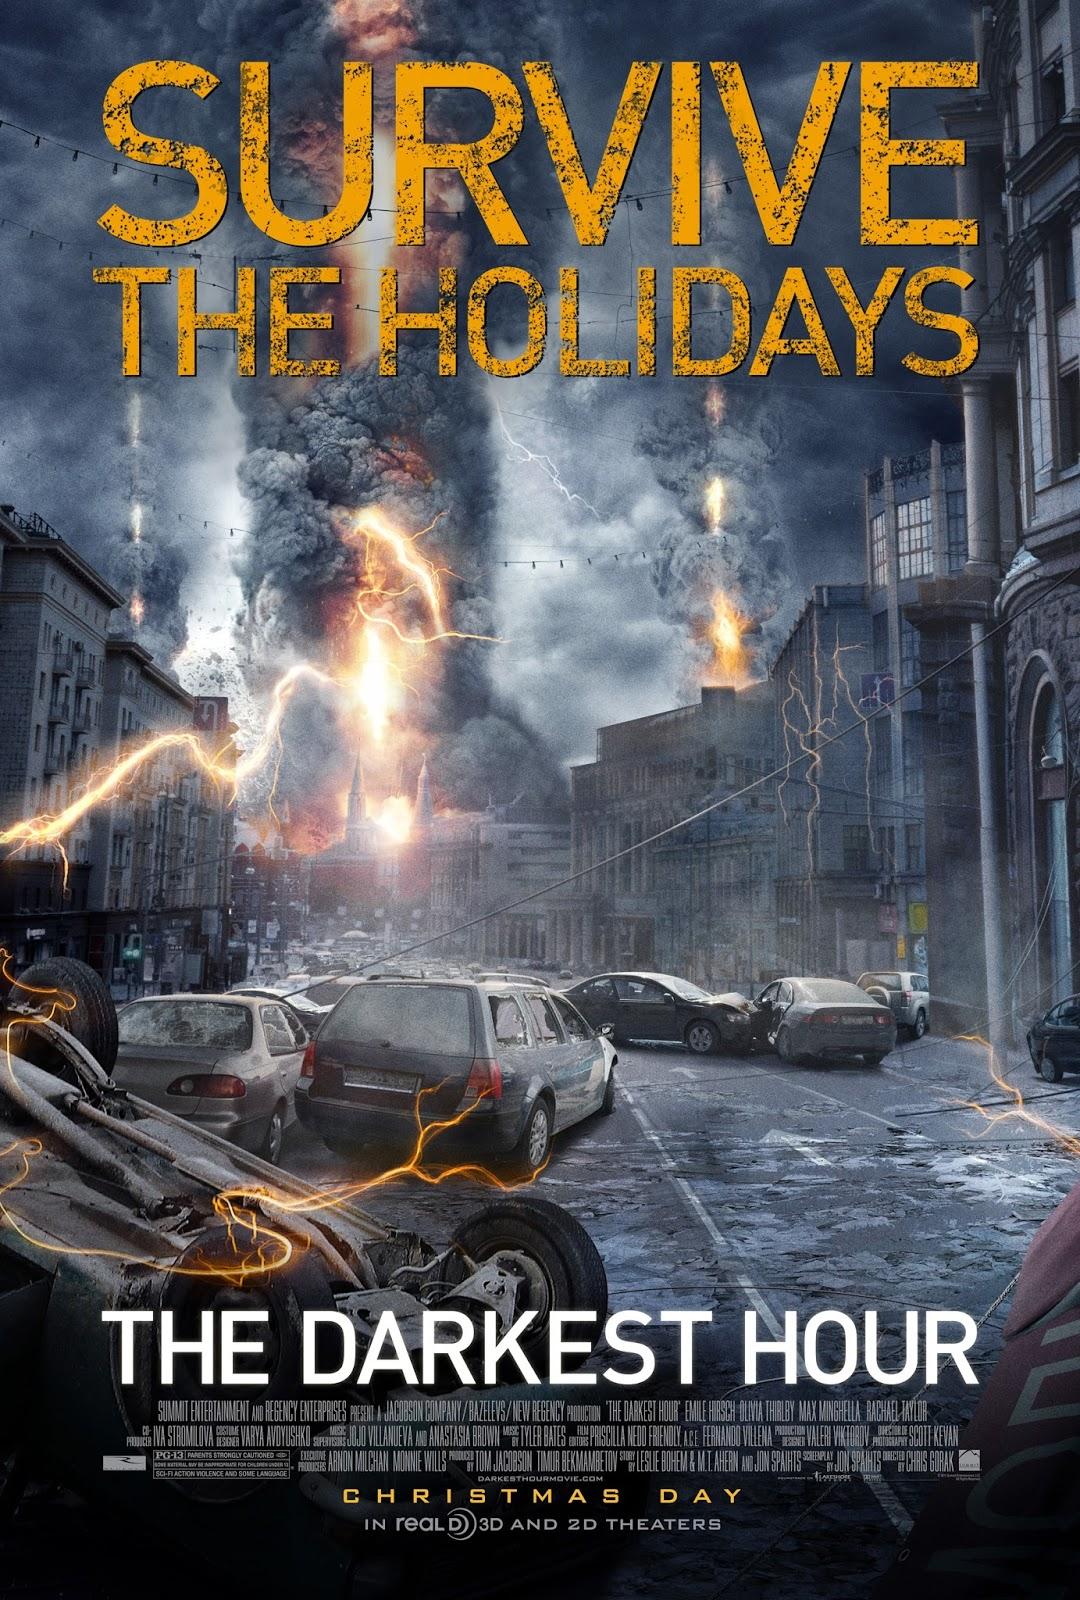 The Darkest Hour มหันตภัยมืดถล่มโลก [HD][พากย์ไทย]